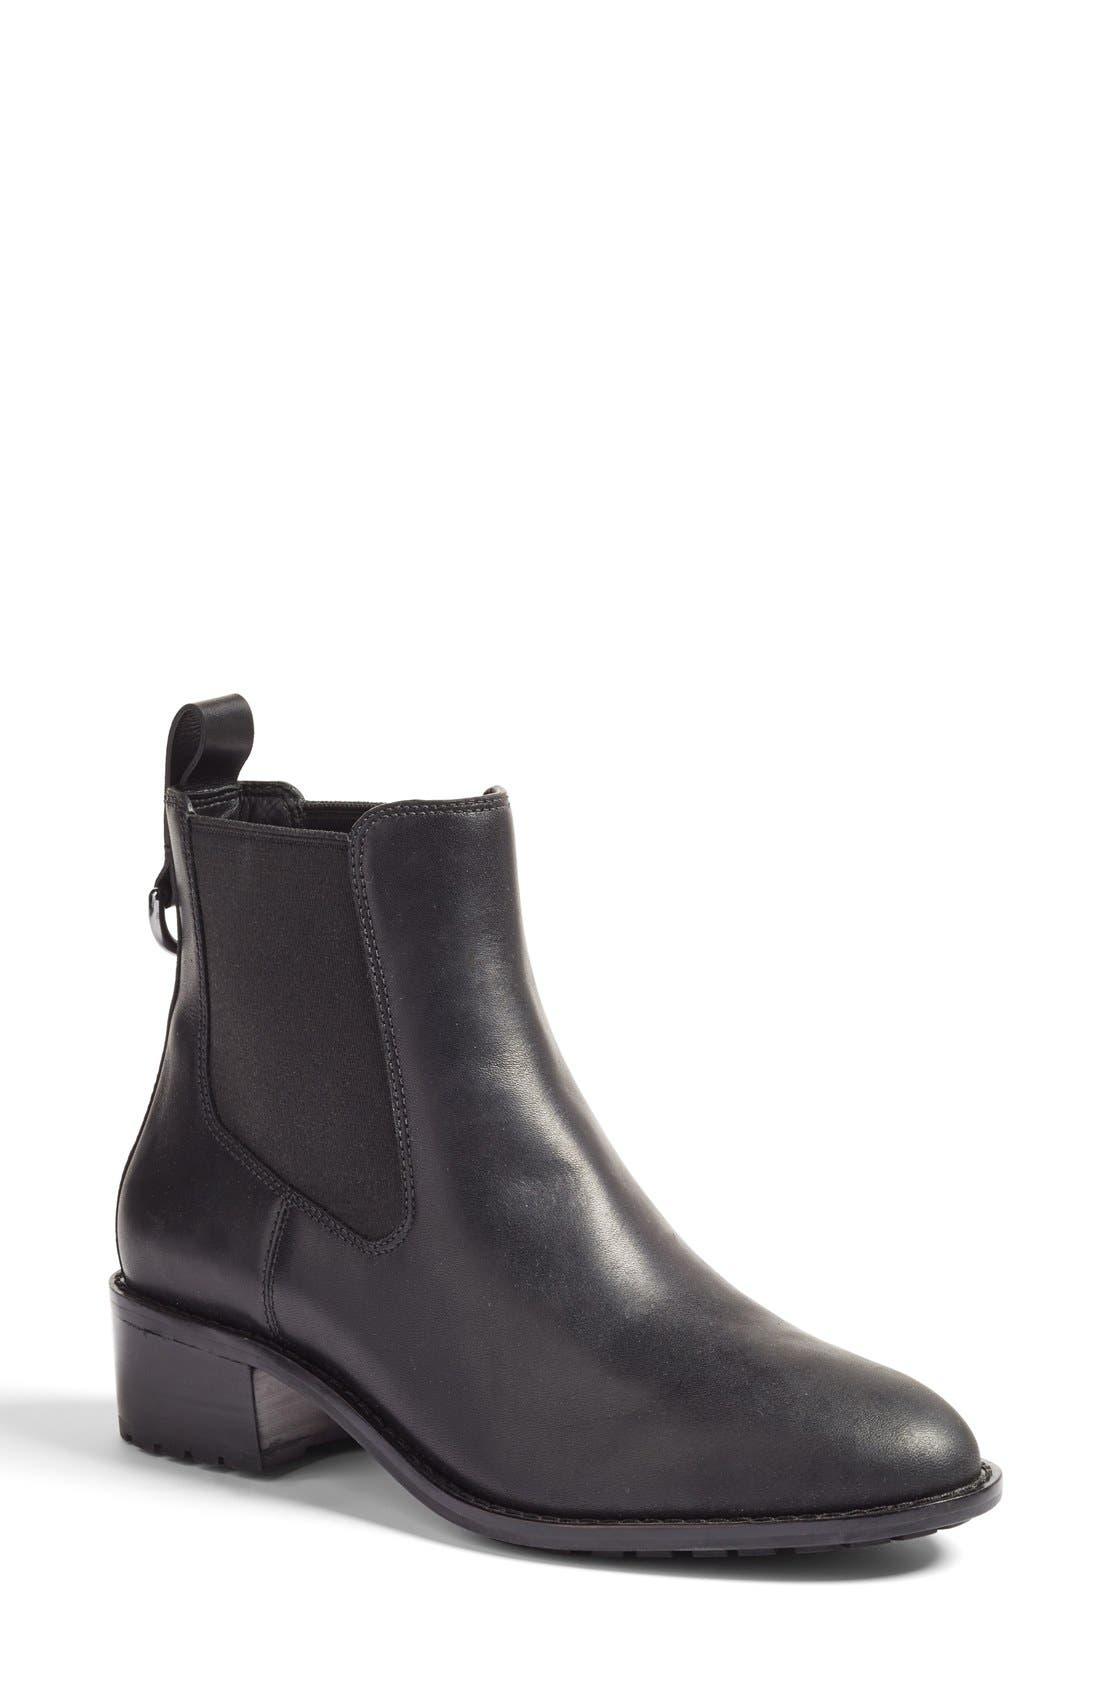 'Newburg' Waterproof Chelsea Boot,                             Main thumbnail 1, color,                             BLACK LEATHER